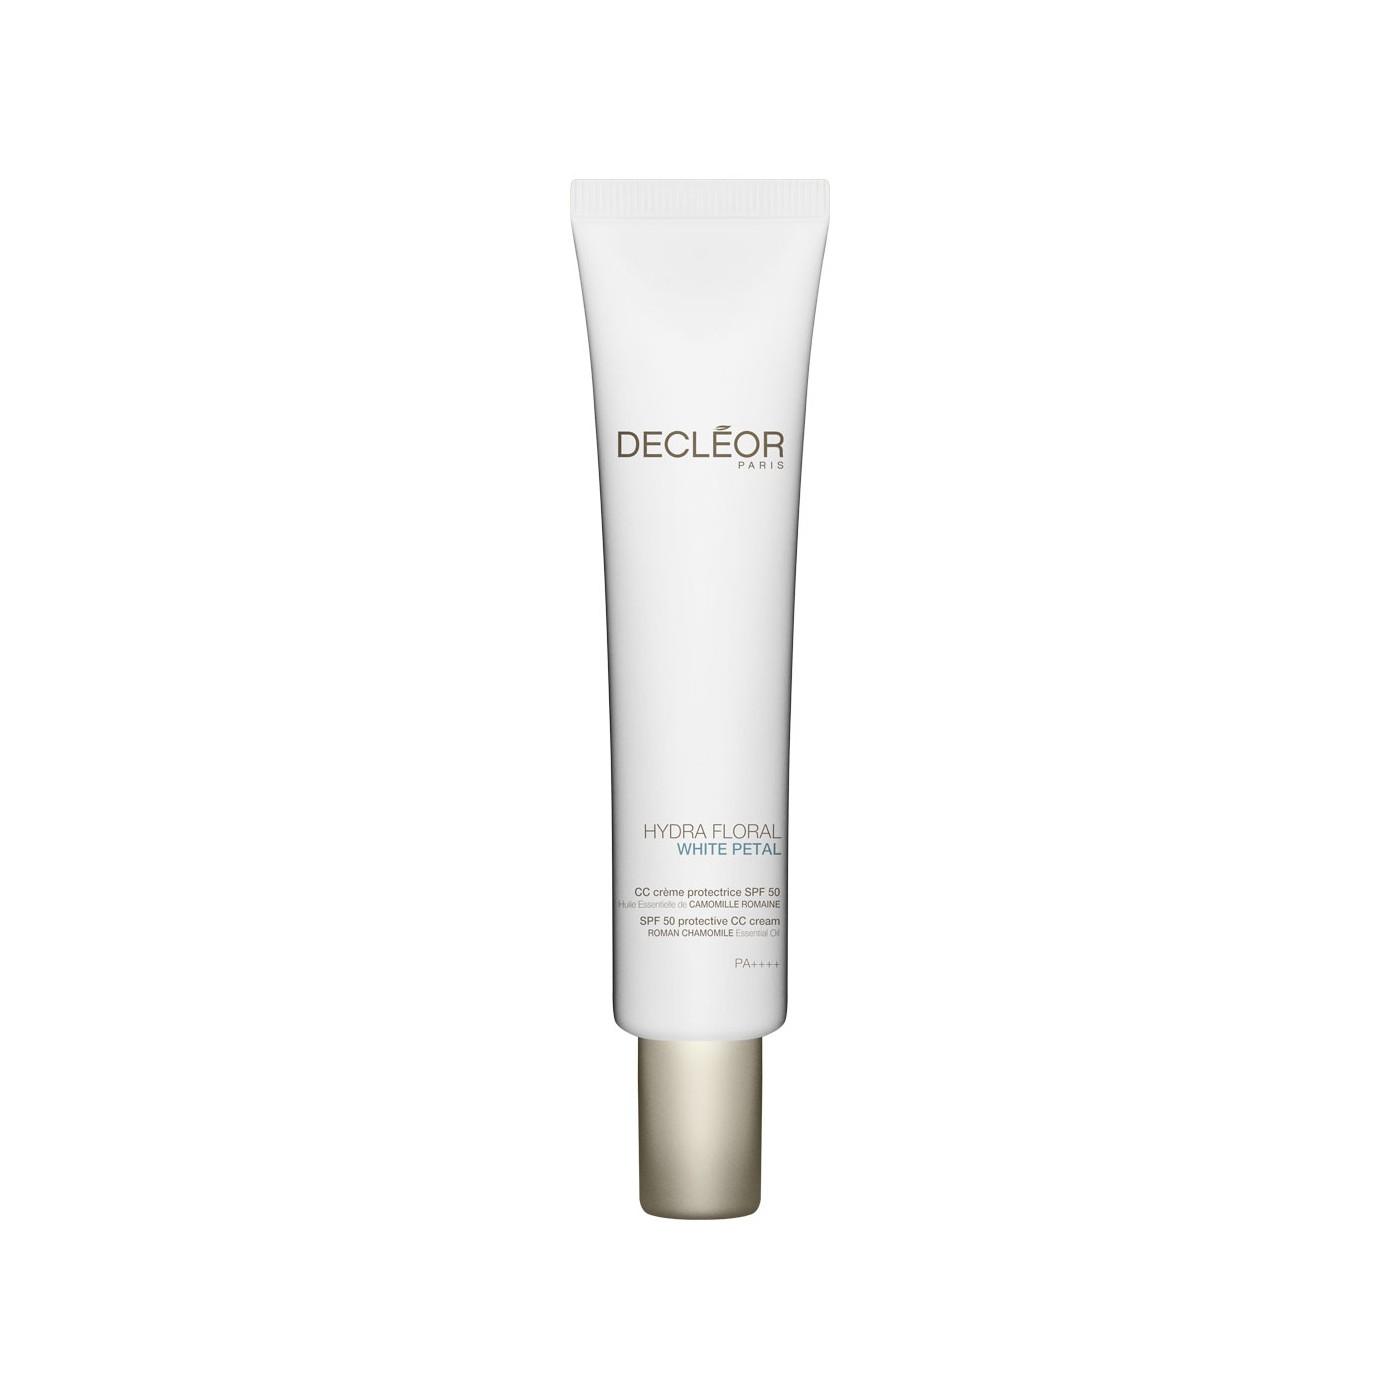 Hydra Floral White Petal CC Cream SPF 50 40ml